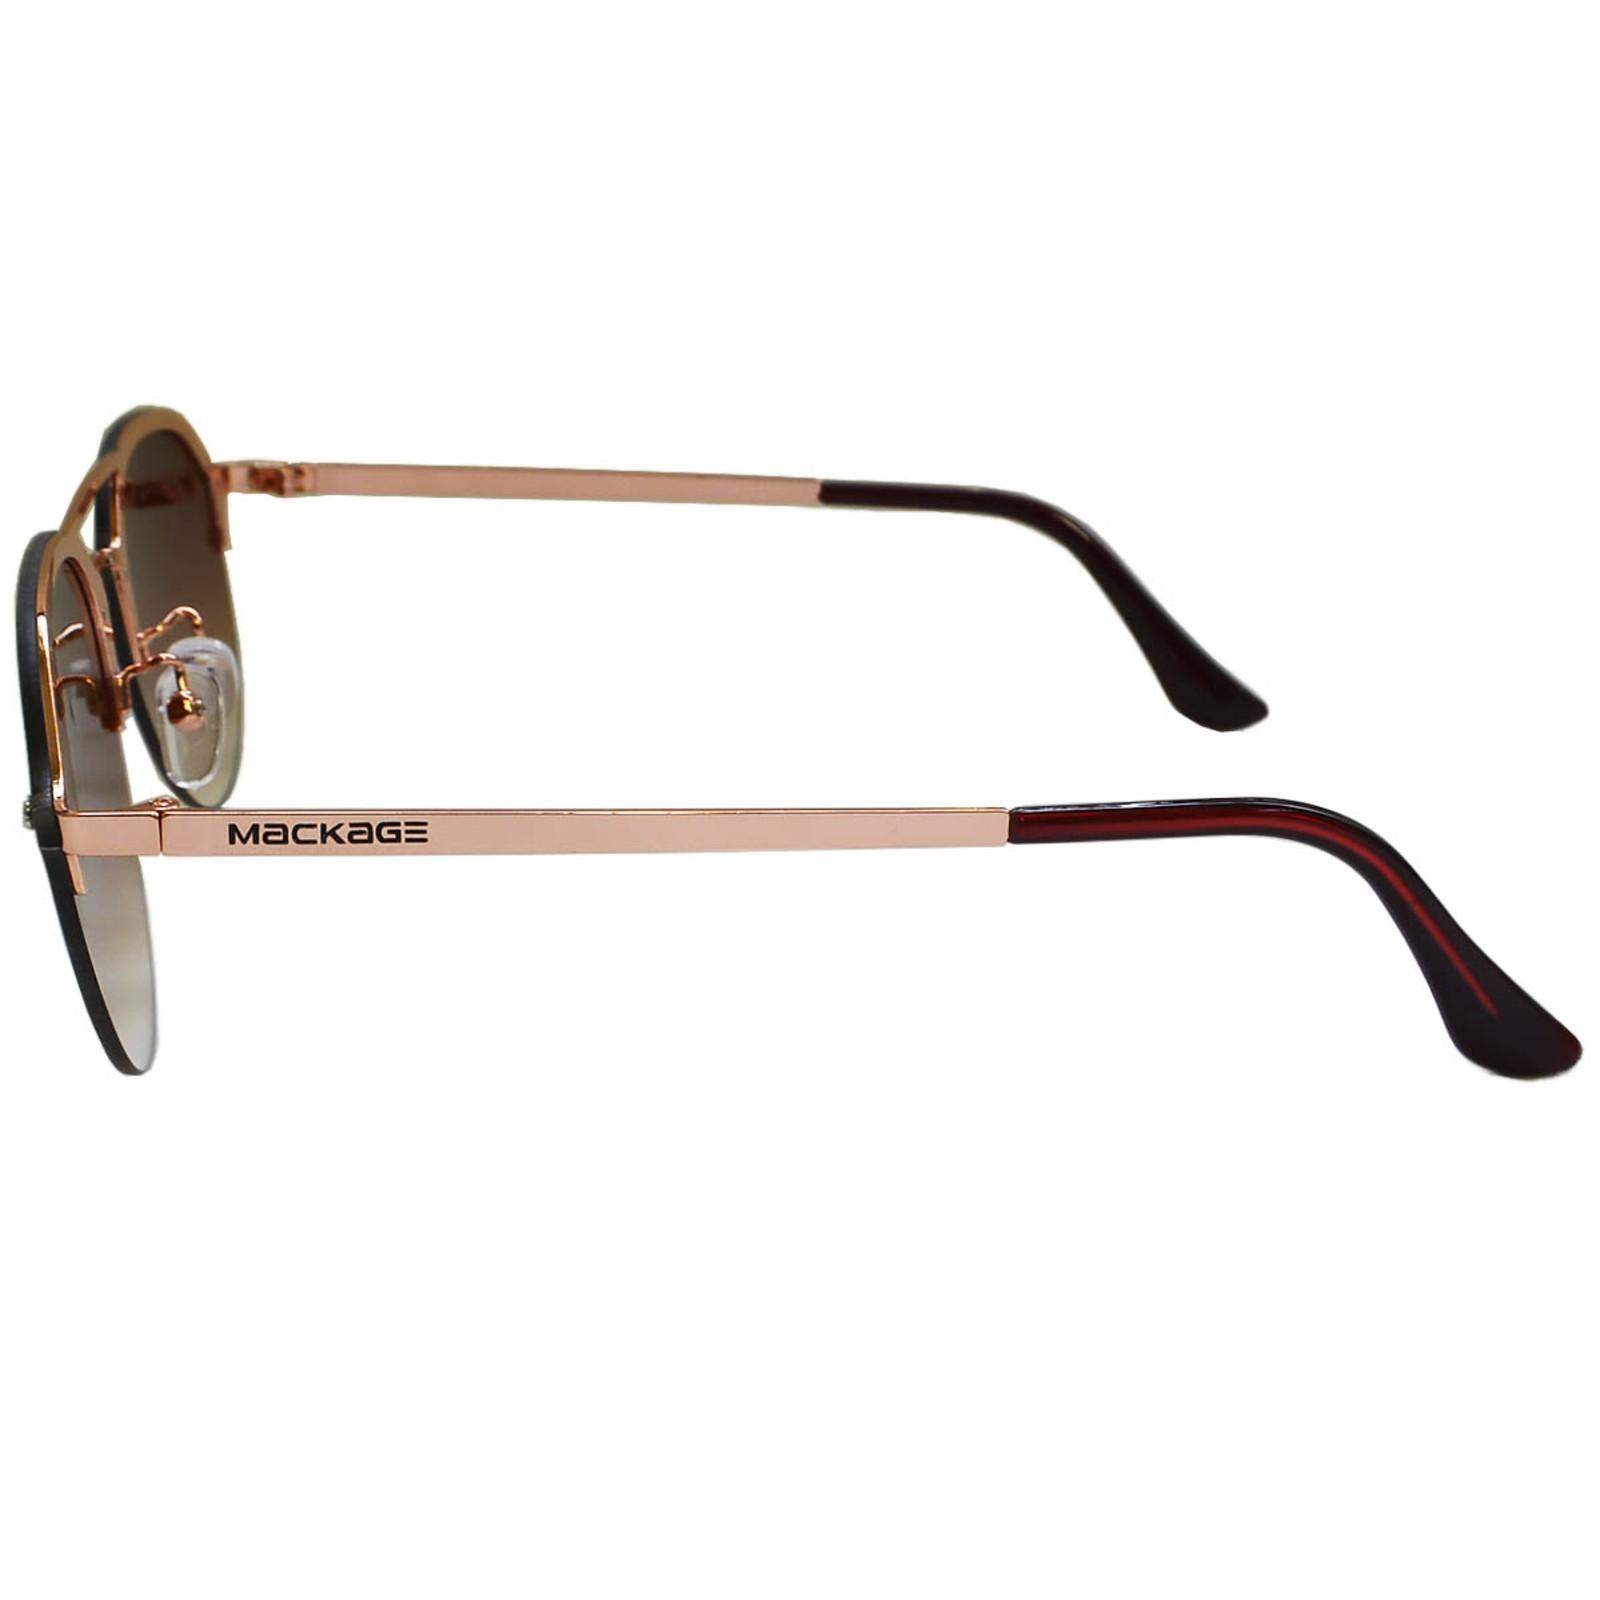 Óculos De Sol Mackage Masculino Metal Aviator Rimless - Marrom